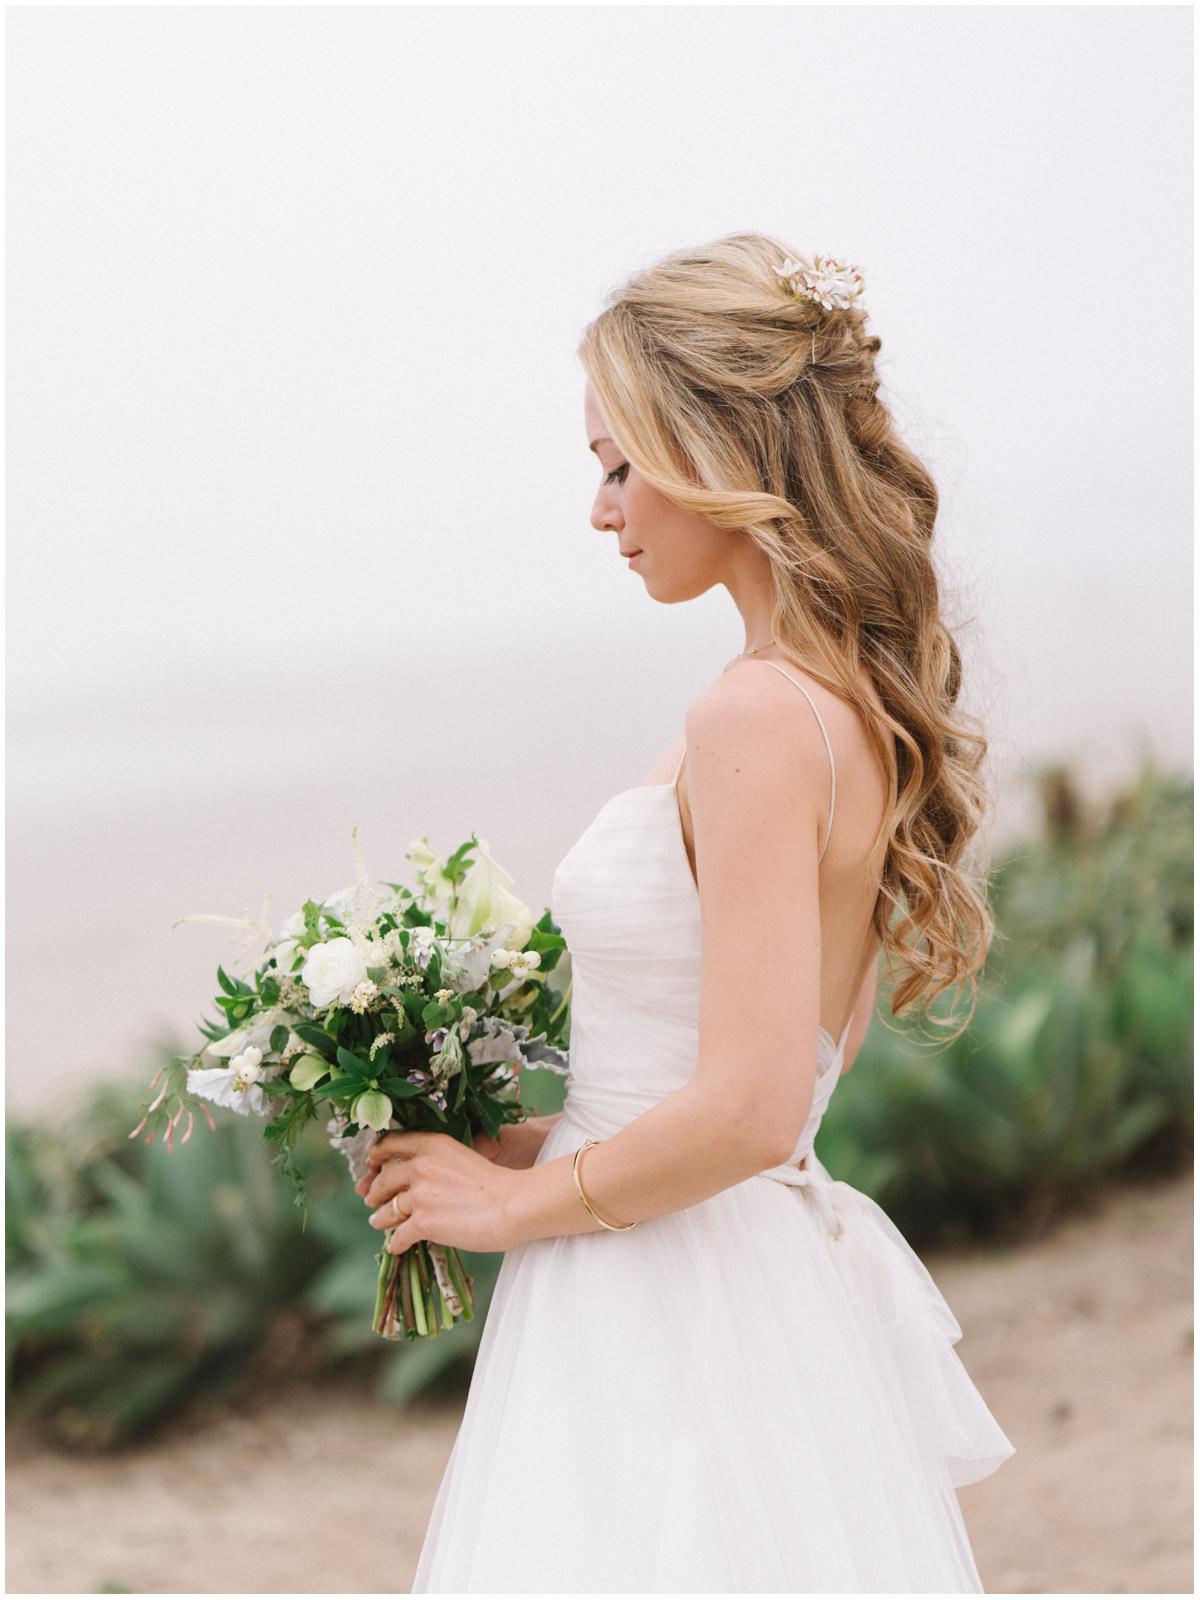 Santa Babara Elopement Wedding Photographer - Pinnel Photography-01-04.jpg